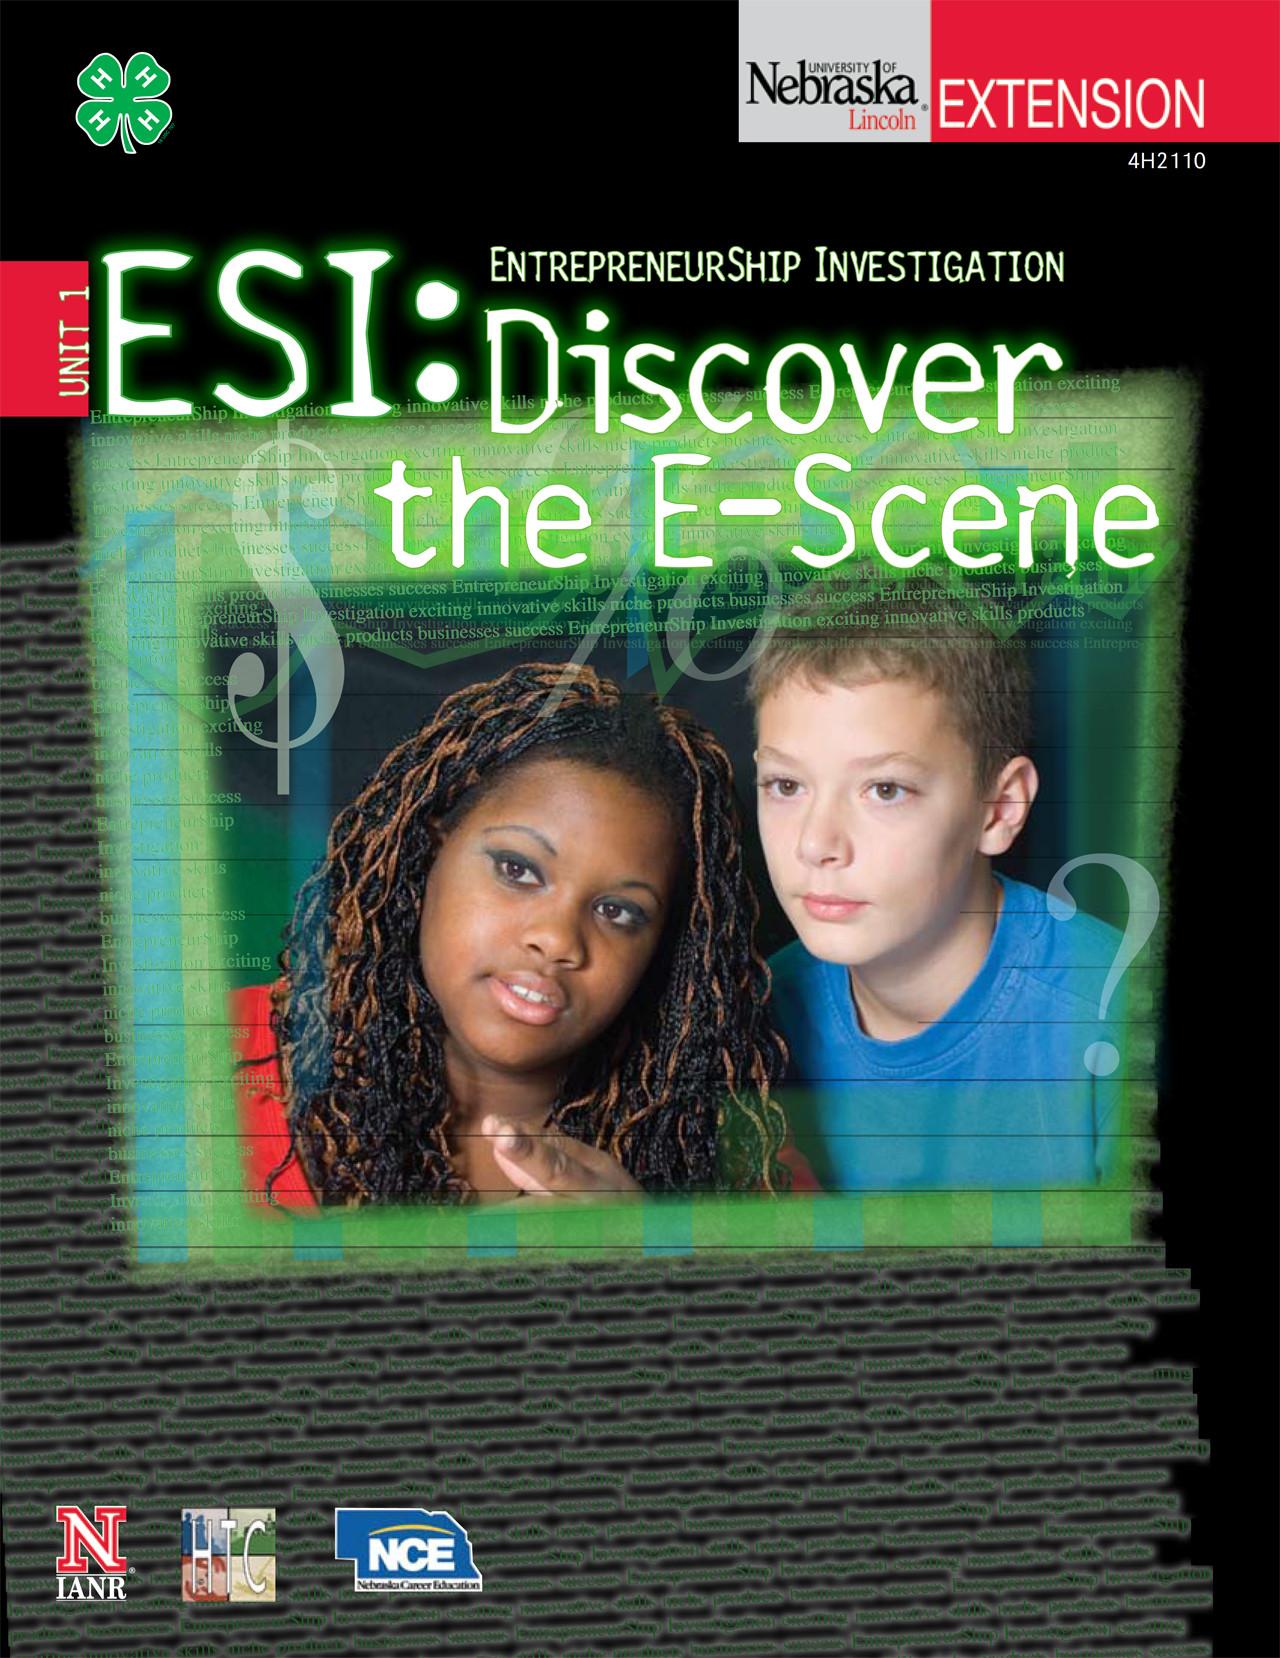 EntrepreneurShip Investigation 1: Discover the E-Scene